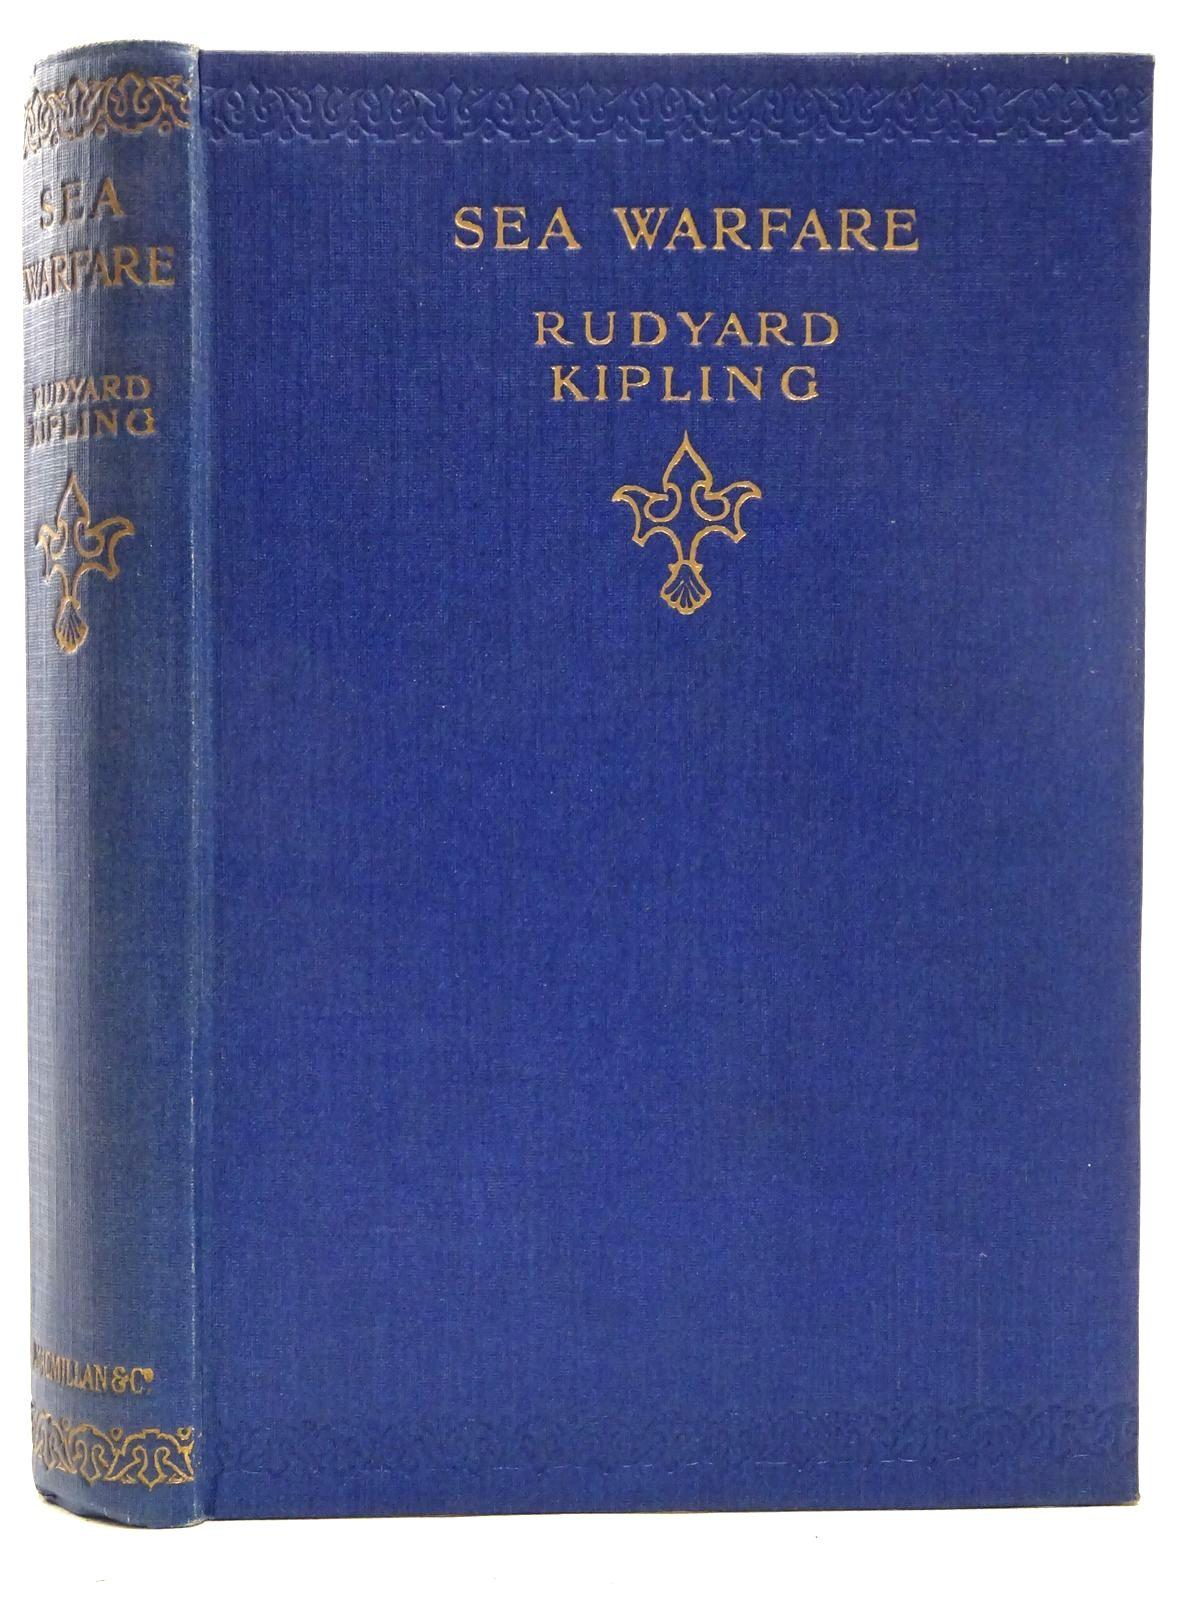 Photo of SEA WARFARE written by Kipling, Rudyard published by Macmillan & Co. Ltd. (STOCK CODE: 2126303)  for sale by Stella & Rose's Books